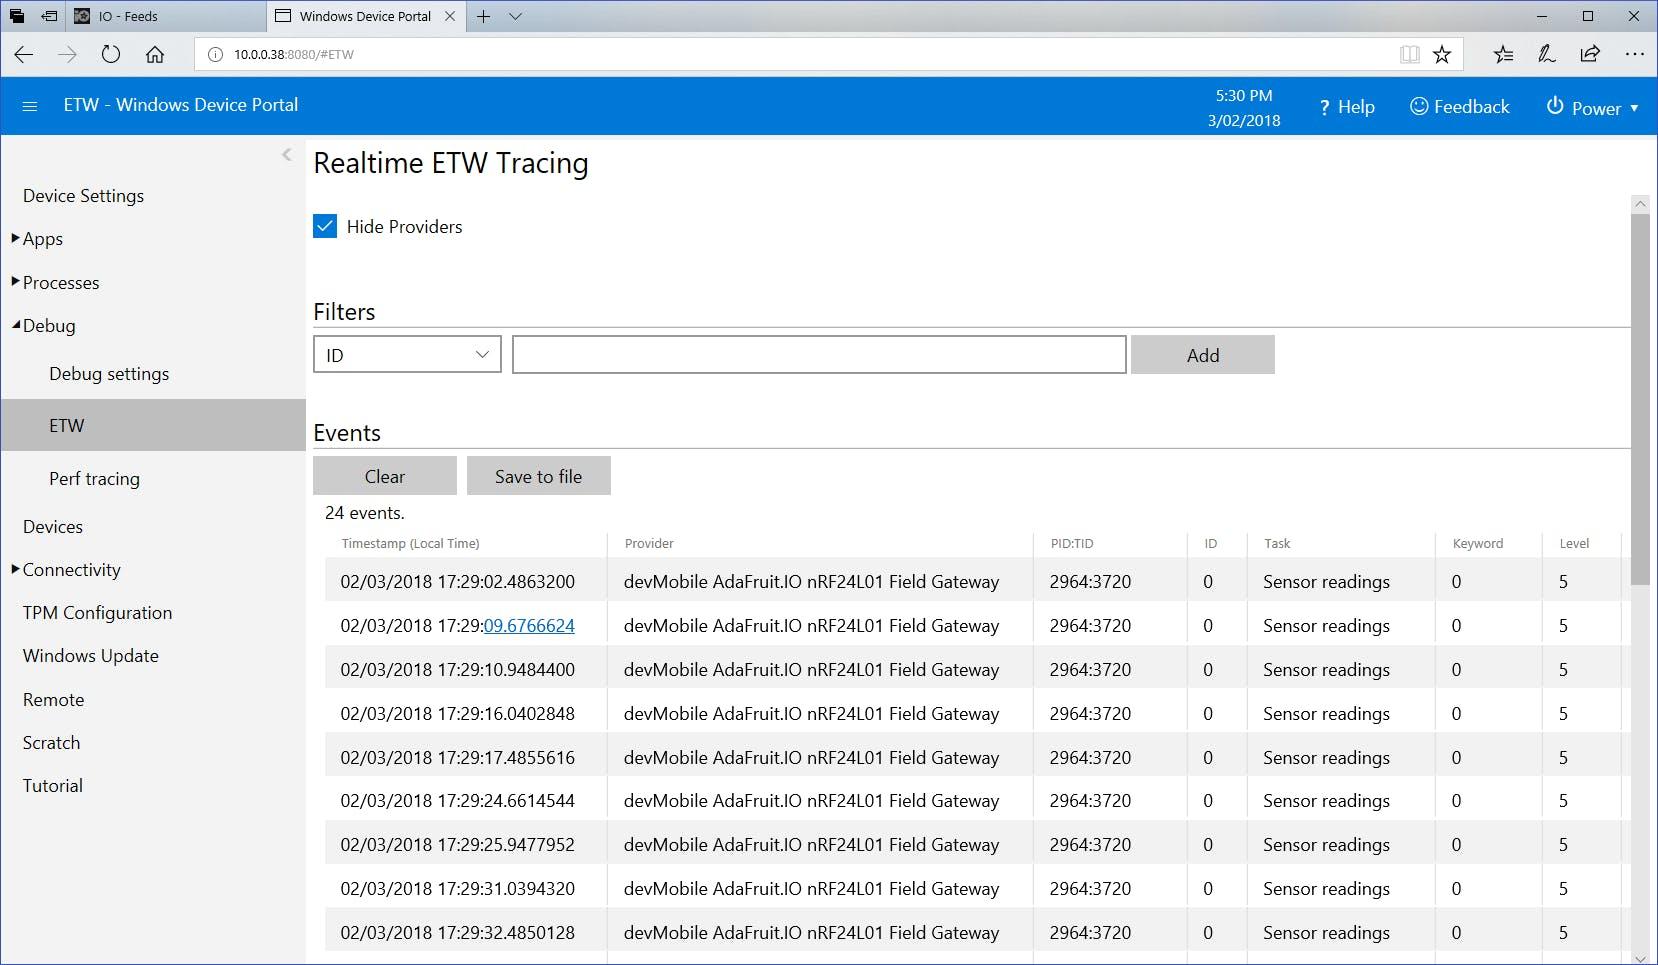 Windows 10 ETW events viewed using device portal